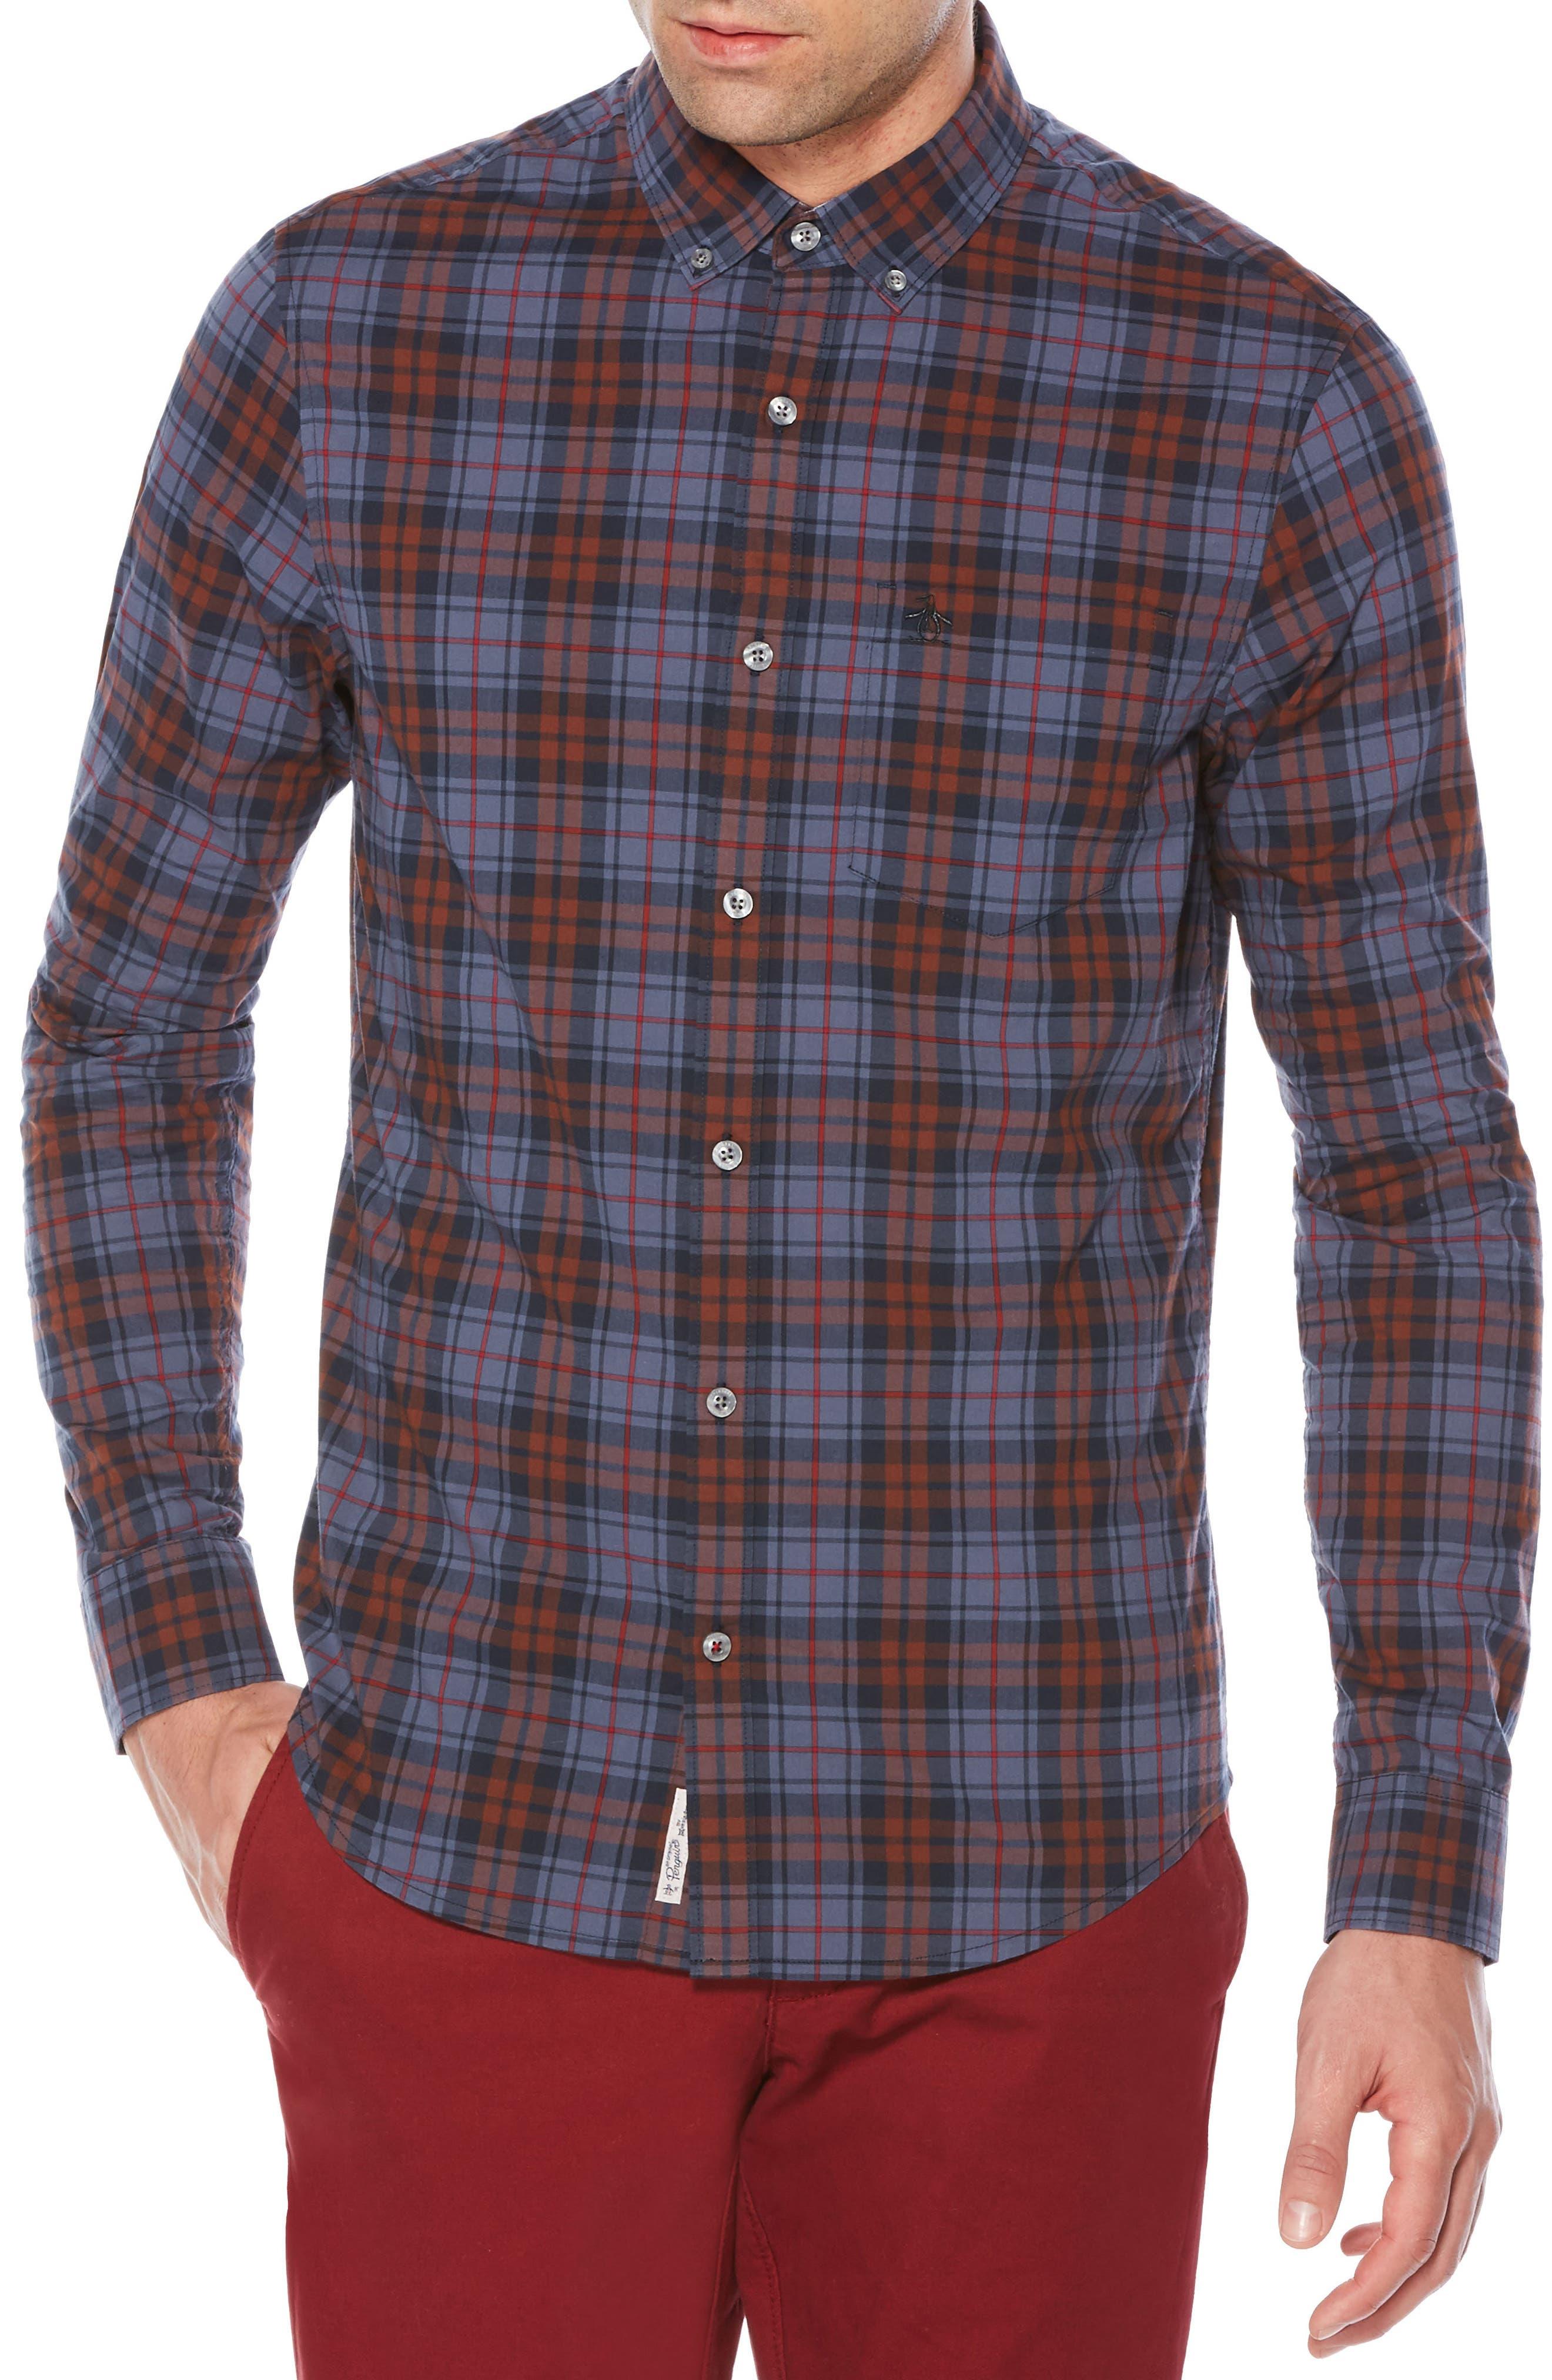 P55 Heritage Slim Fit Plaid Shirt,                         Main,                         color, Dark Sapphire